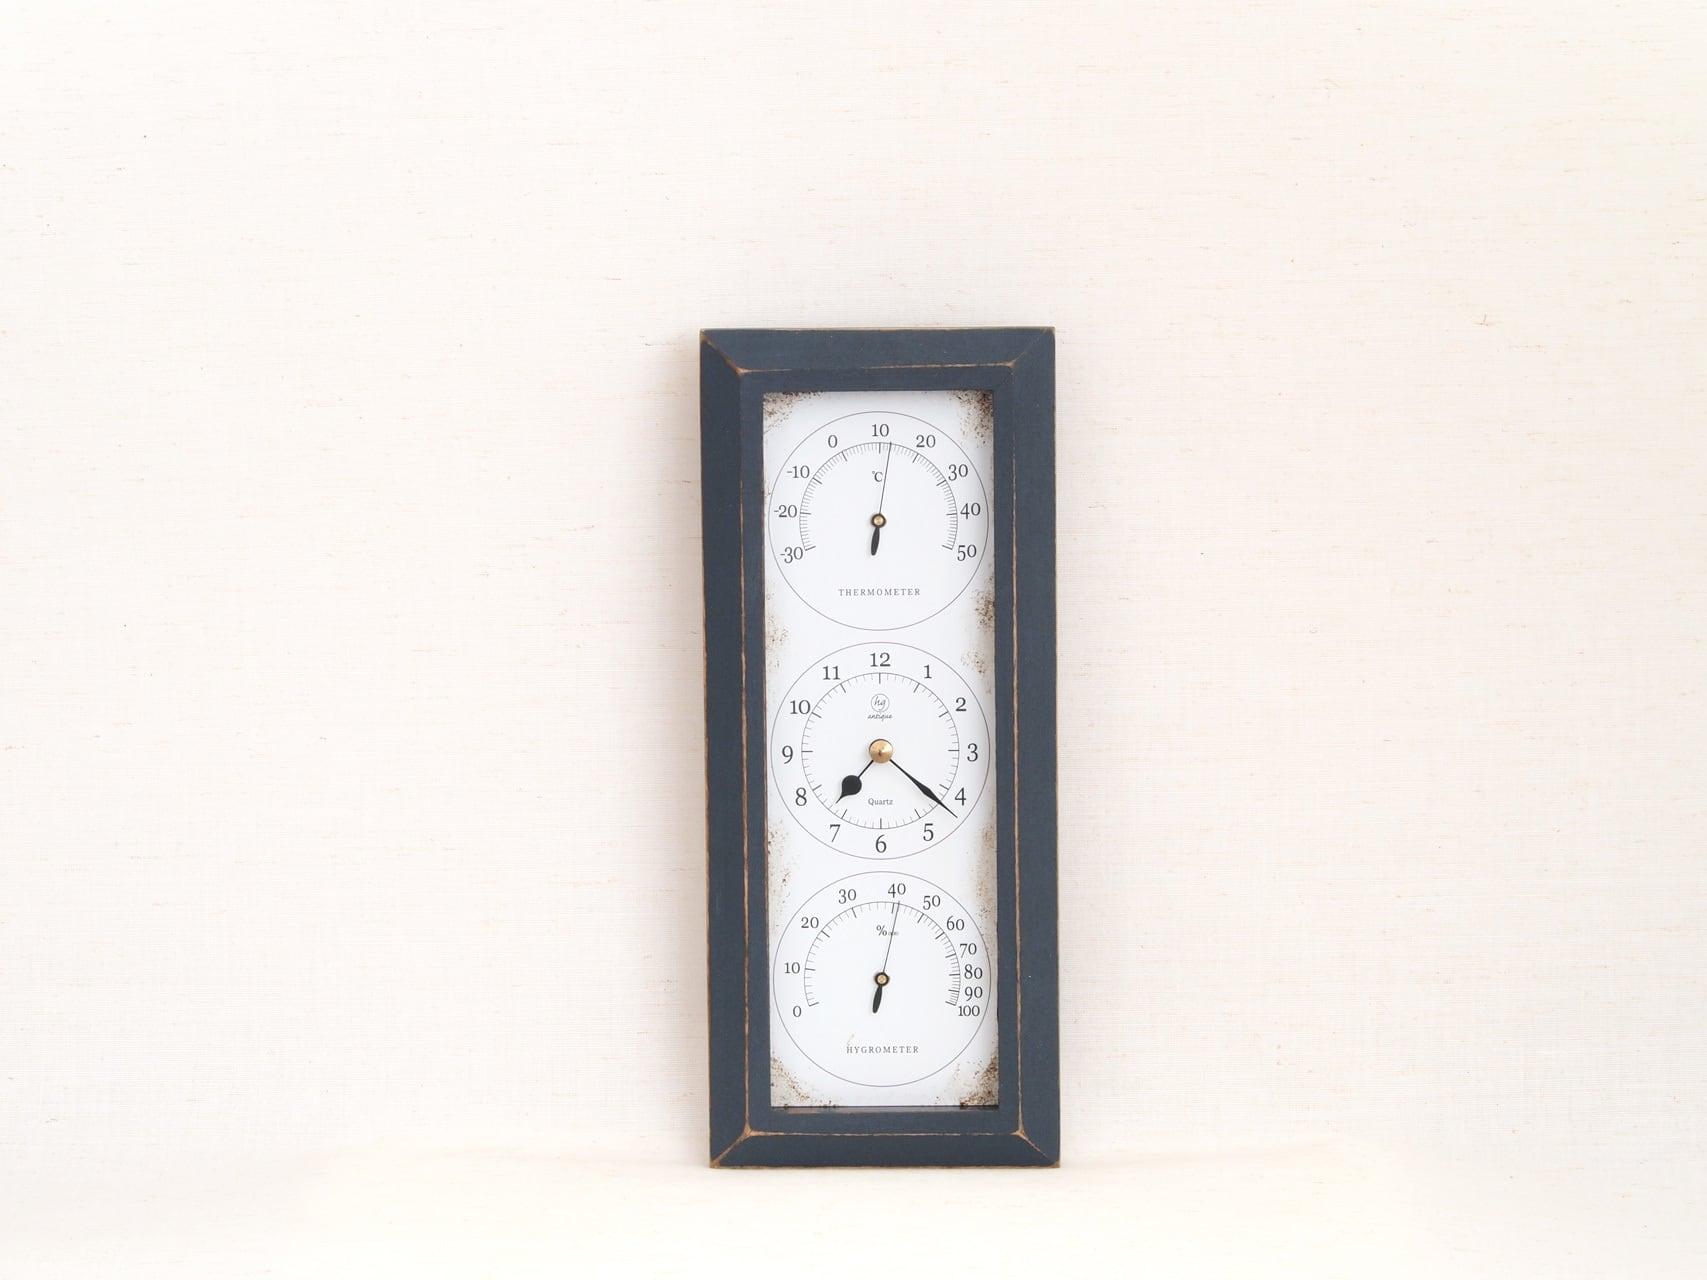 HAKARU ハカル / 温湿度計 時計 Antique Clock アンティーククロック 縦型 壁掛け ブルー YT-904